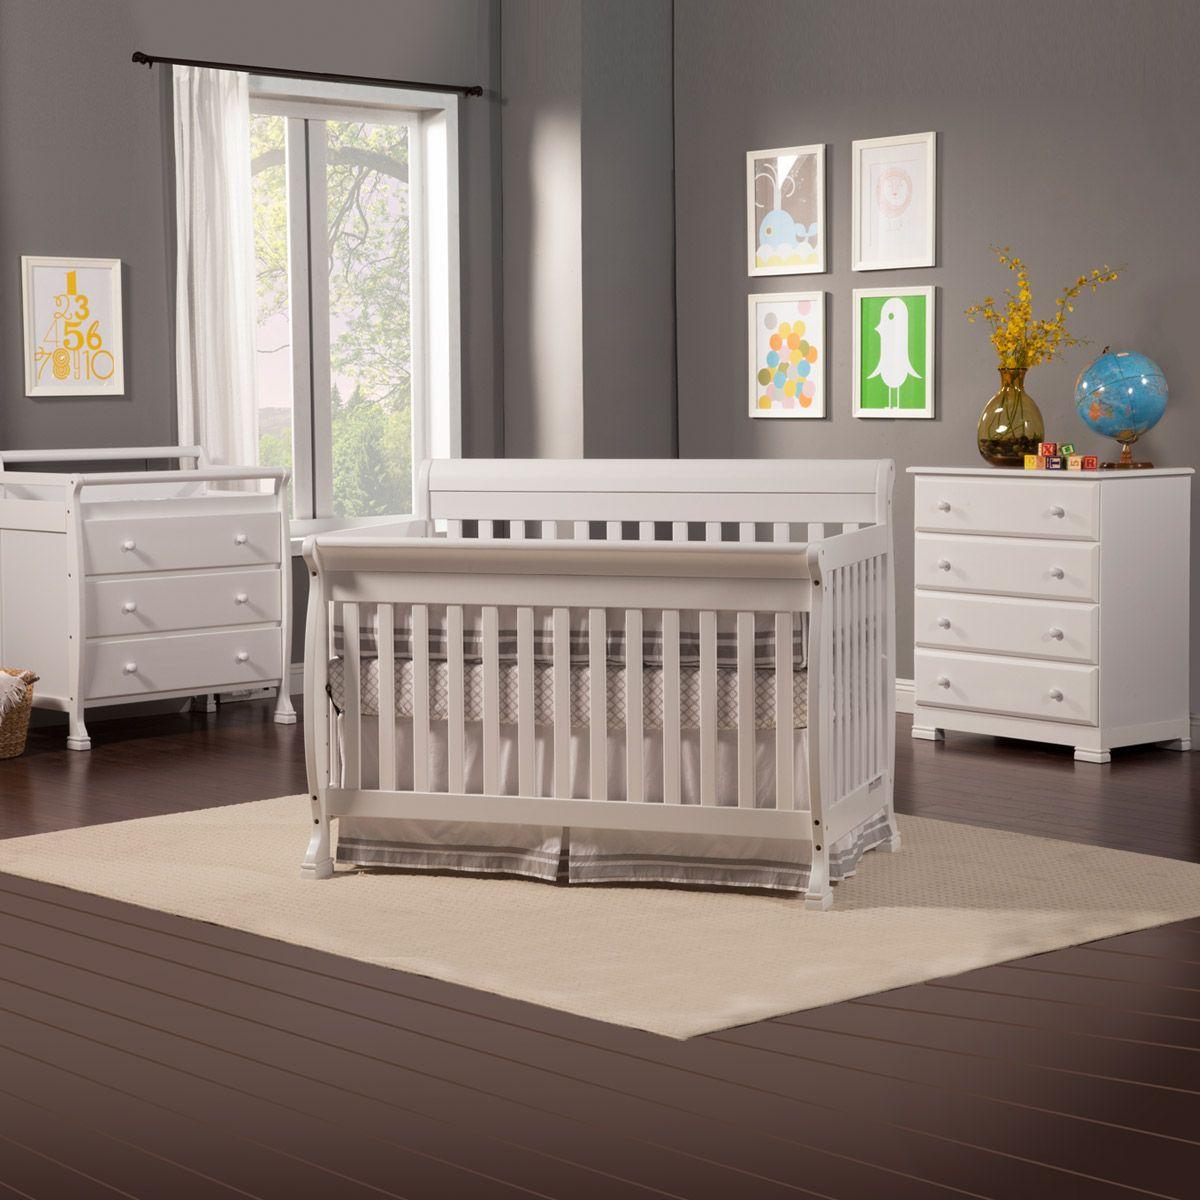 Da Vinci 3 Piece Nursery Set Kalani Convertible Crib Kalani 3 Drawer Changer 4 Drawer Dresser White Free Shipping Davinci Convertible Crib Sets Convertible Crib Cribs [ 1200 x 1200 Pixel ]